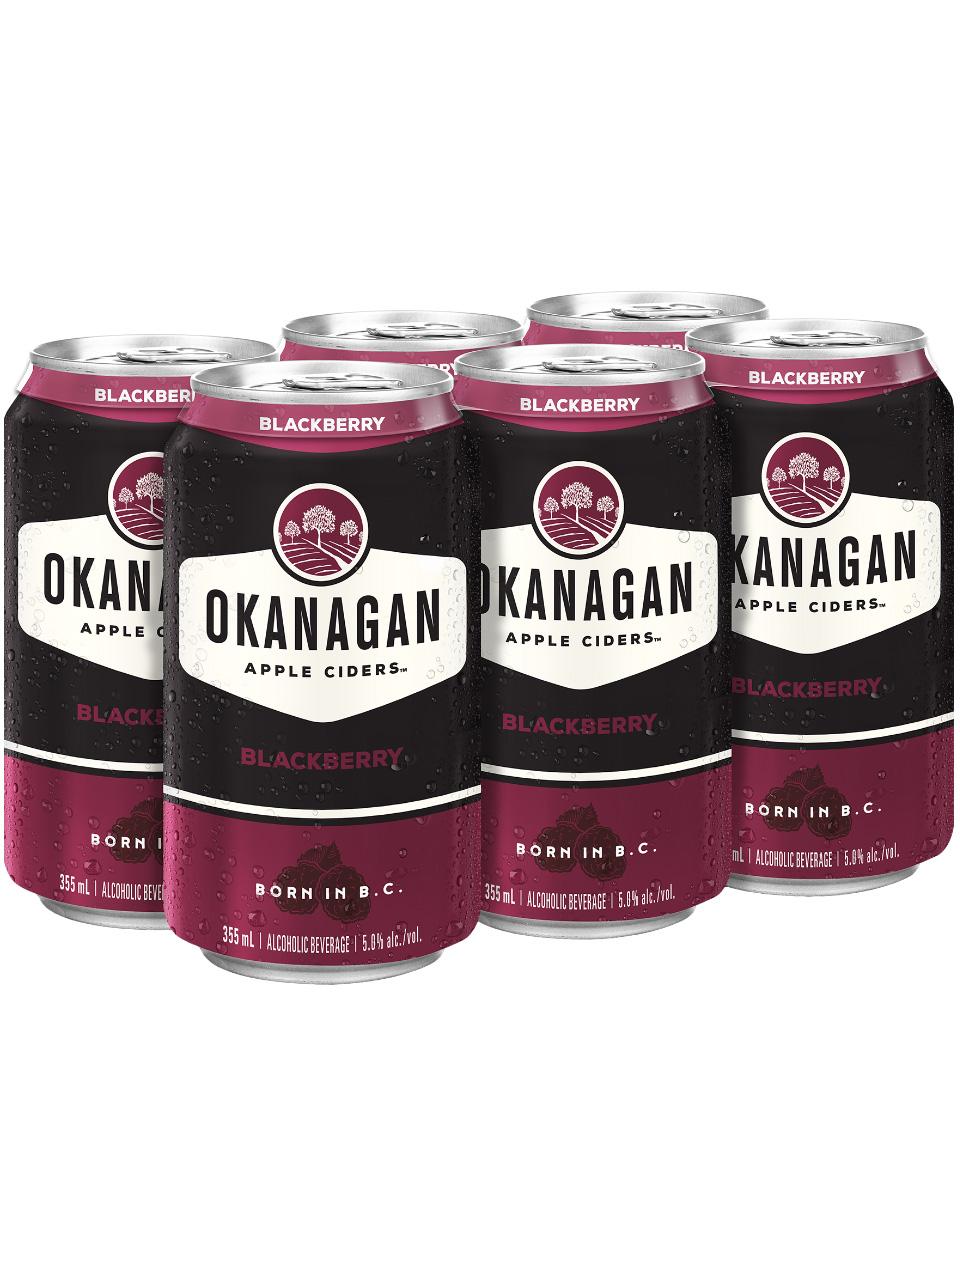 Okanagan Blackberry Cider 6 Pack Cans